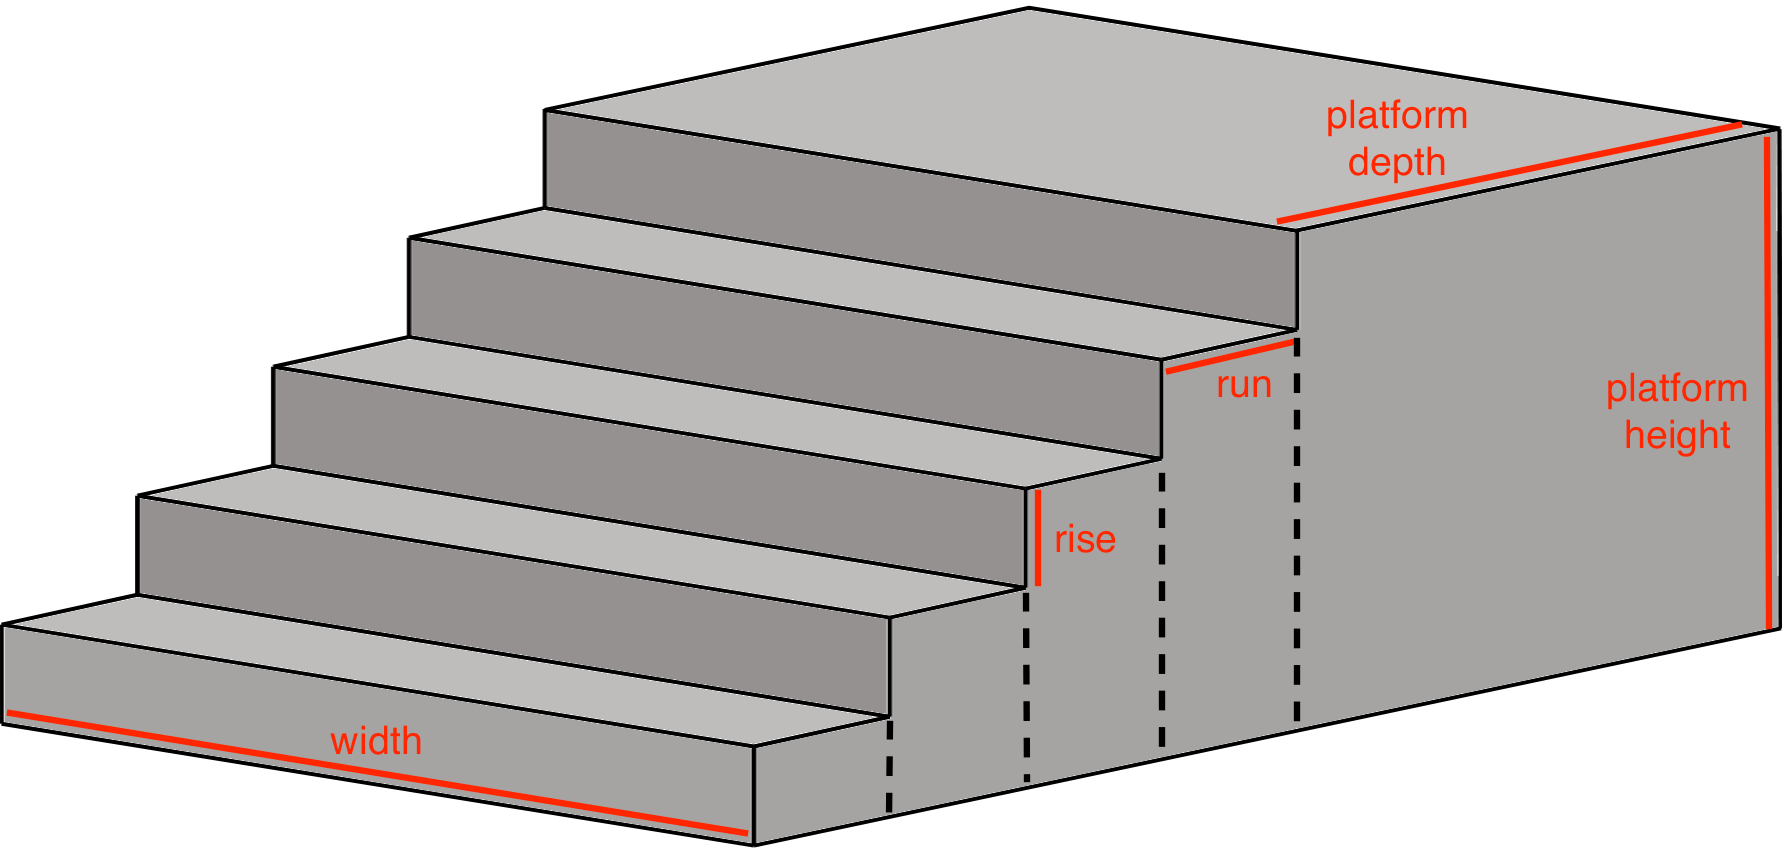 Concrete Steps Calculator Estimate Yards Needed For Concrete Stairs Concrete Steps Concrete Calculator Concrete Stairs